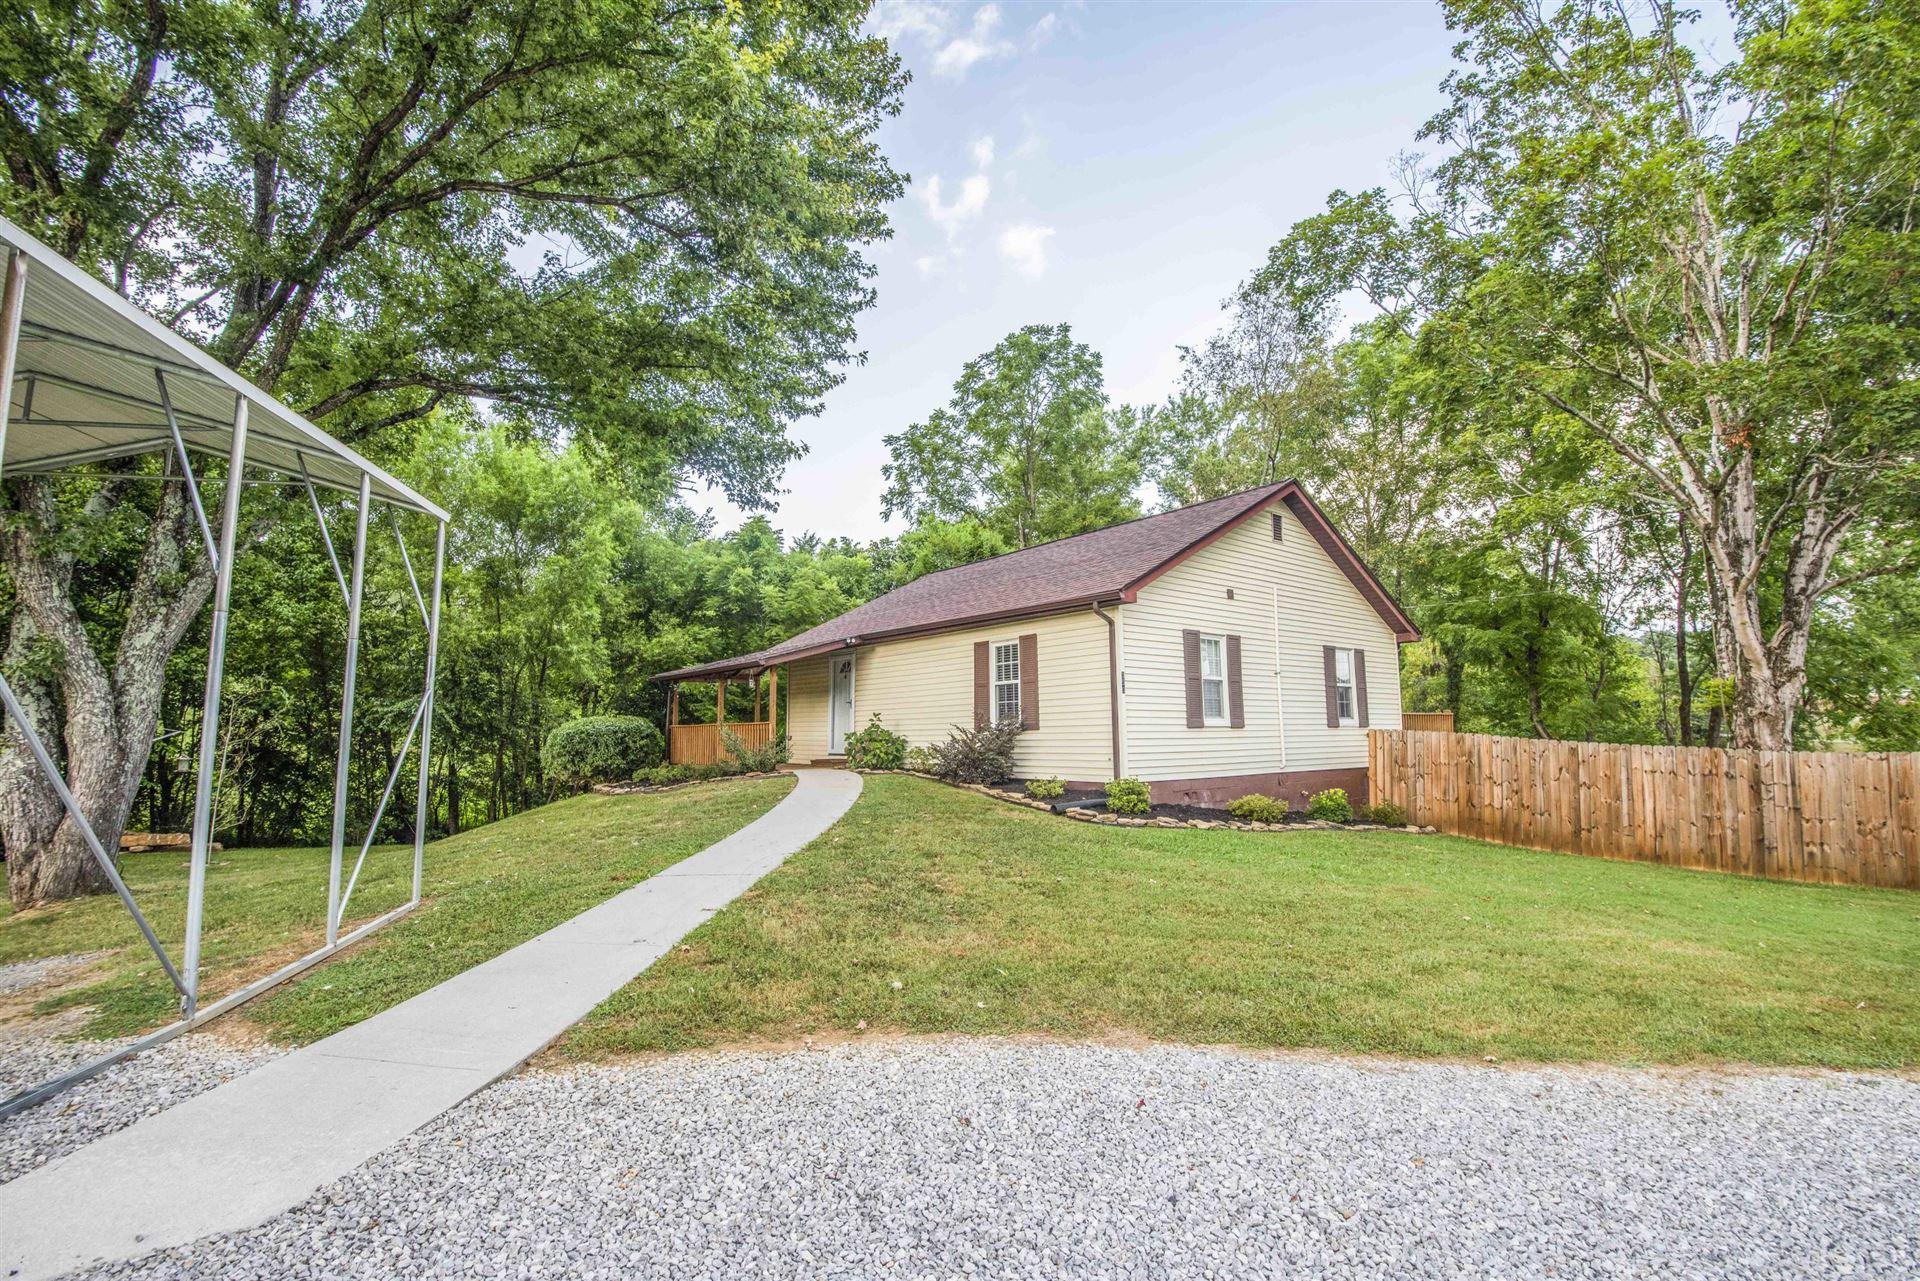 Photo of 350 Highland Park Drive, Lenoir City, TN 37772 (MLS # 1162371)